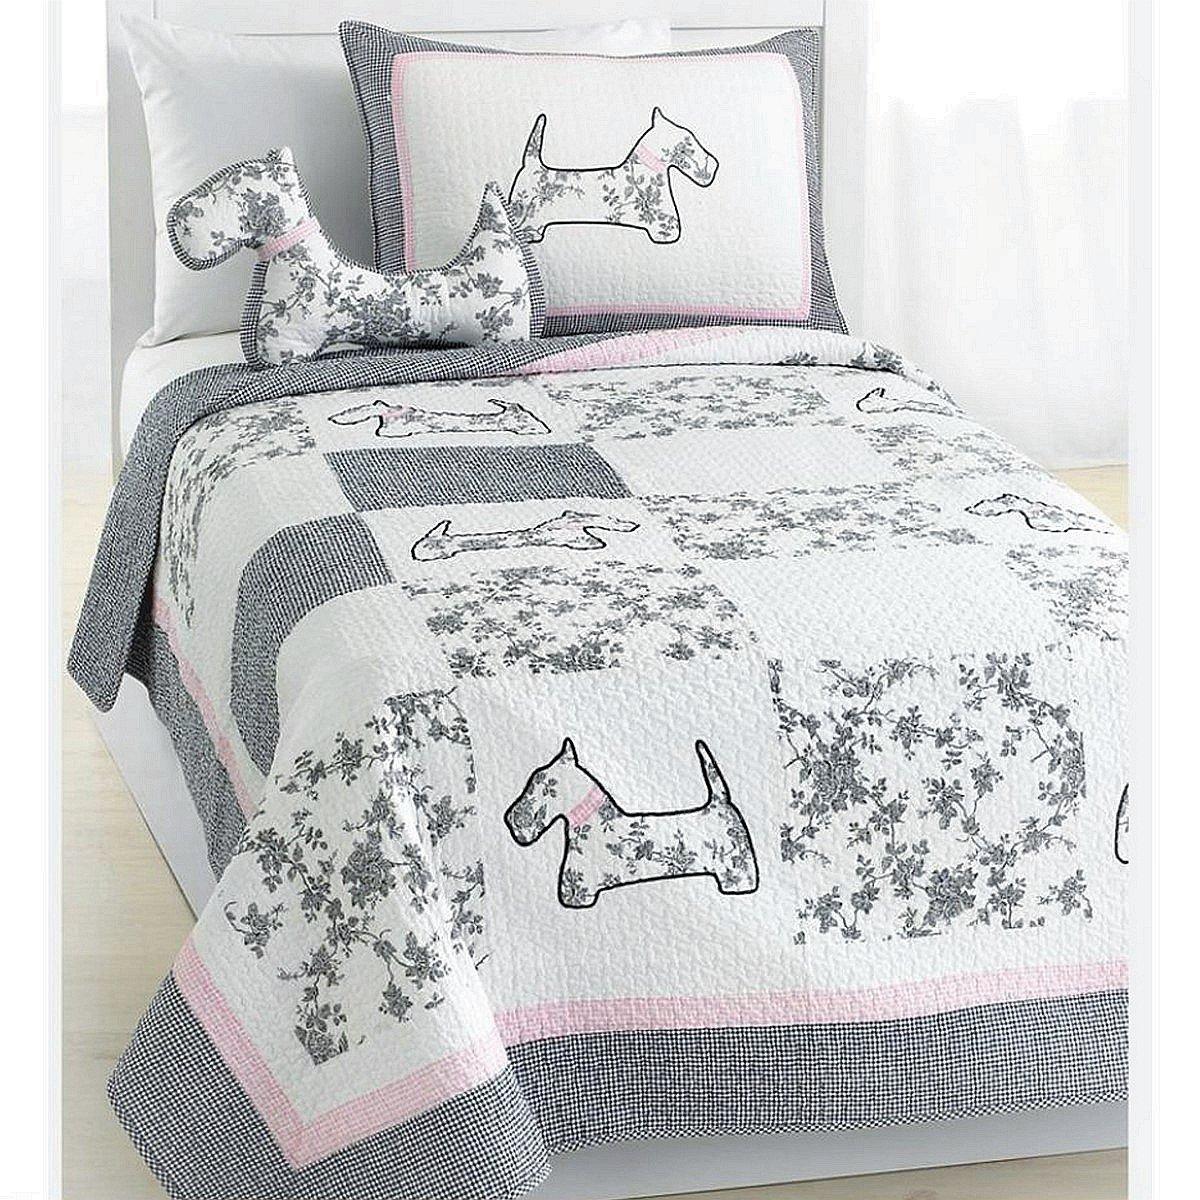 Cozy Line Home Fashions Scottie Pup Pink White Grey Dog Flower Pattern Printed Patchwork Cotton Bedding Quilt Set Coverlet Bedspreads(Grey/White, Queen - 3 Piece: 1 Quilt + 2 Standard Shams)